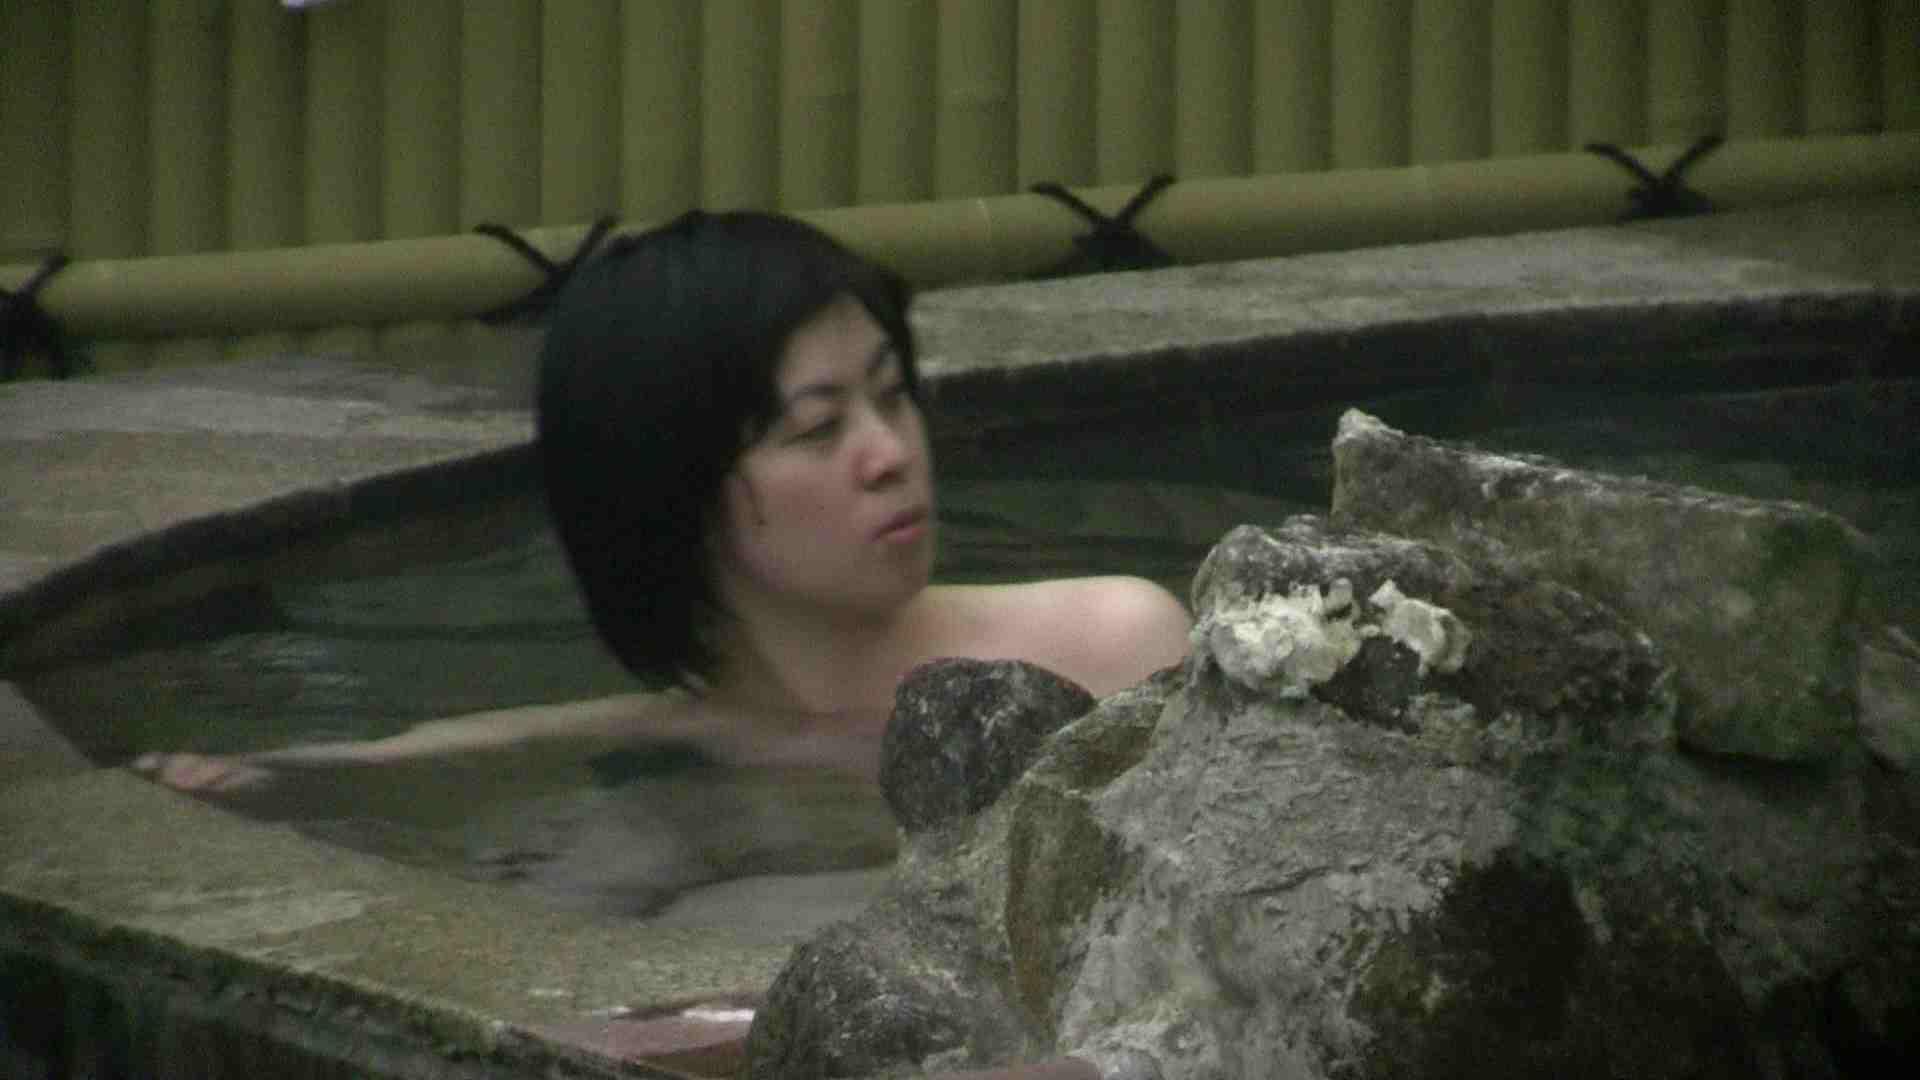 Aquaな露天風呂Vol.685 盗撮シリーズ | 露天風呂編  95PIX 33